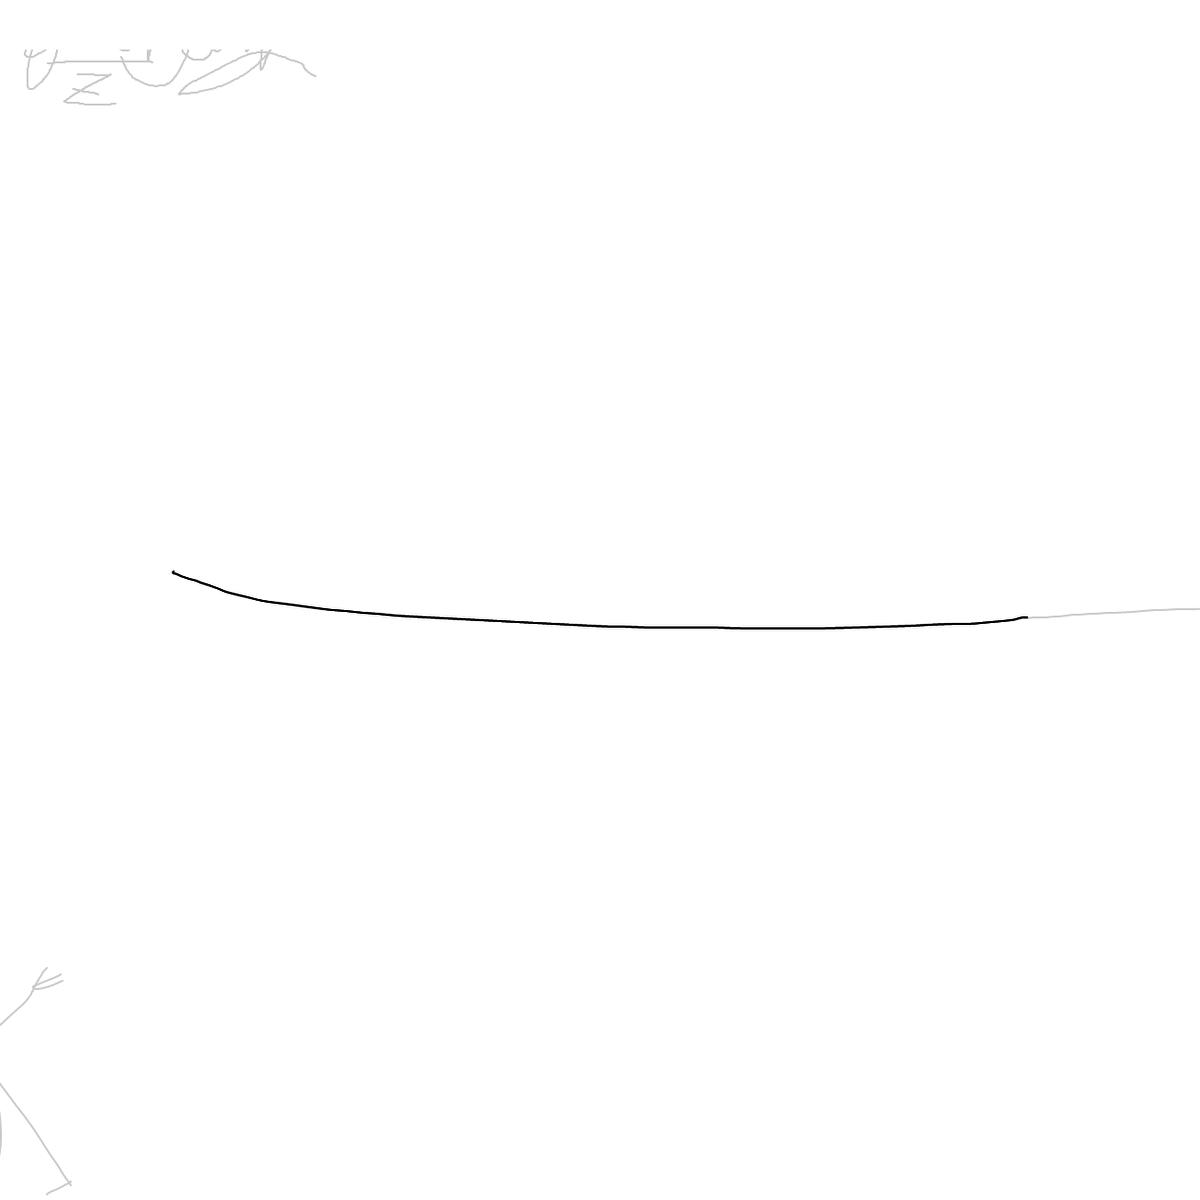 BAAAM drawing#18085 lat:40.7131080627441400lng: -74.0121765136718800